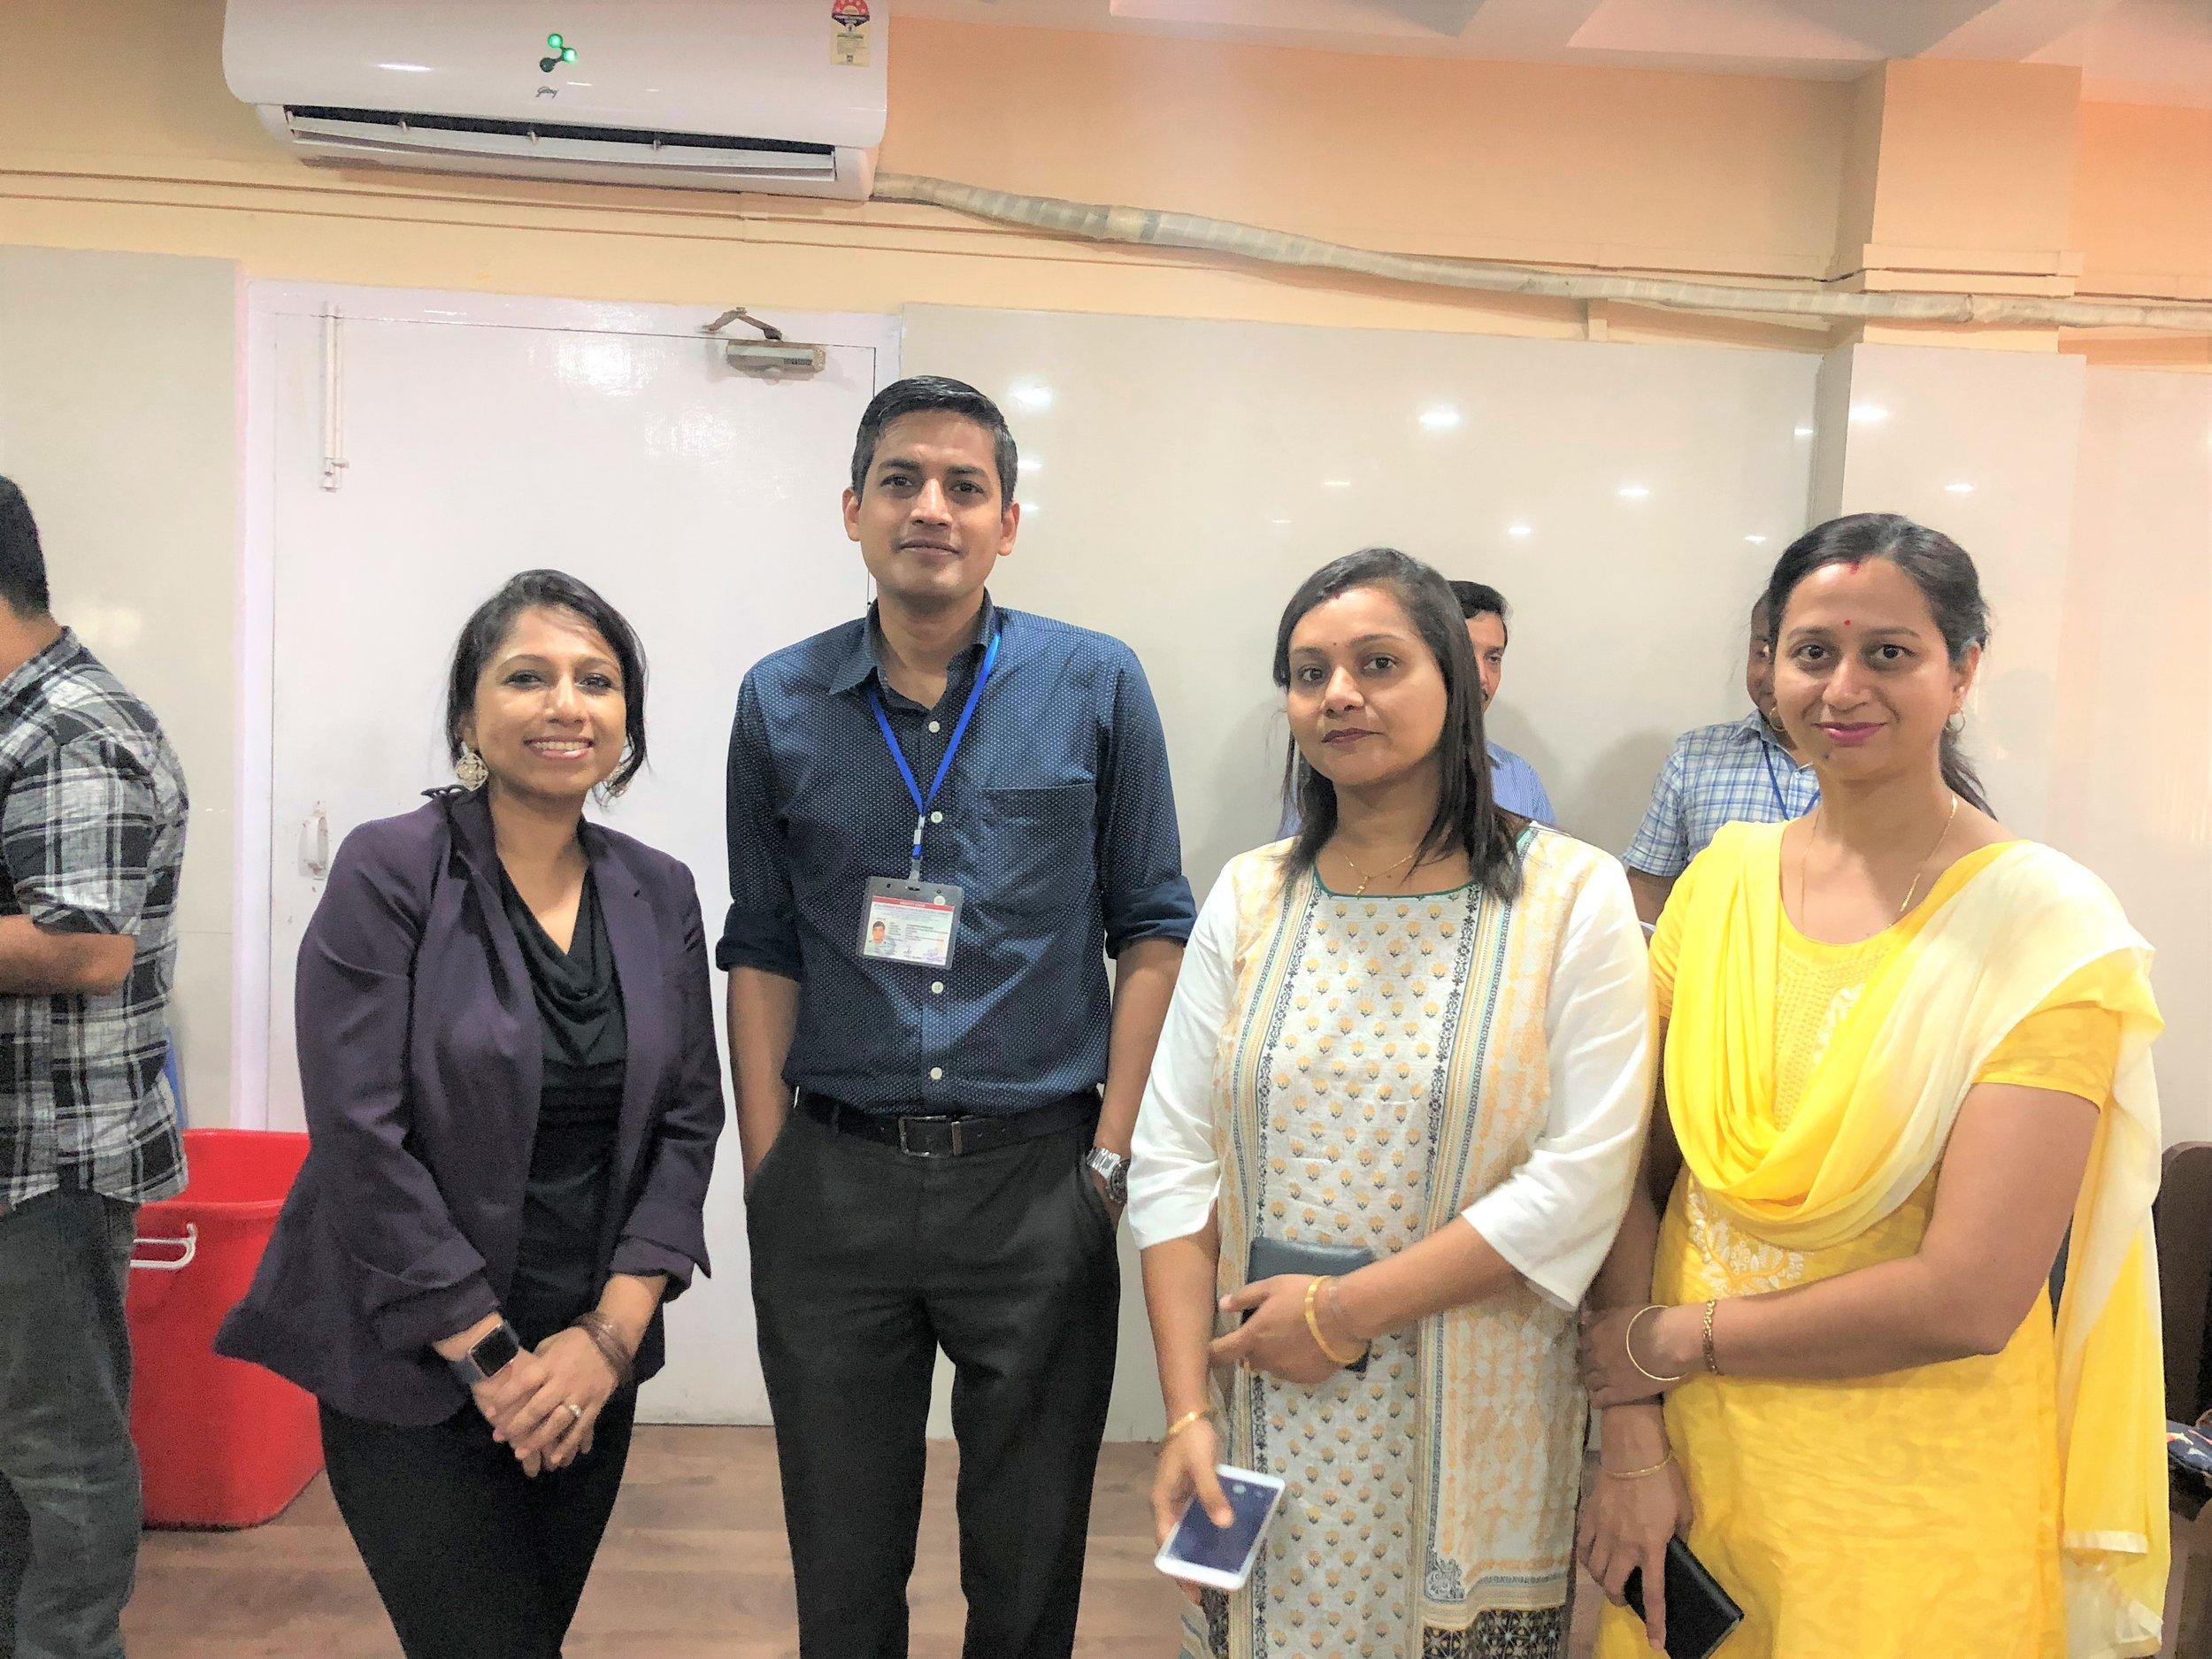 R to L: Dr. Nizara Baishya, Research Scientist, Mrs. Arpita Sharma, Computer Programmer of Population Cancer Registry, Dr. M. Krishnatreya, Medical Officer, Cancer Registry and Epidemiology